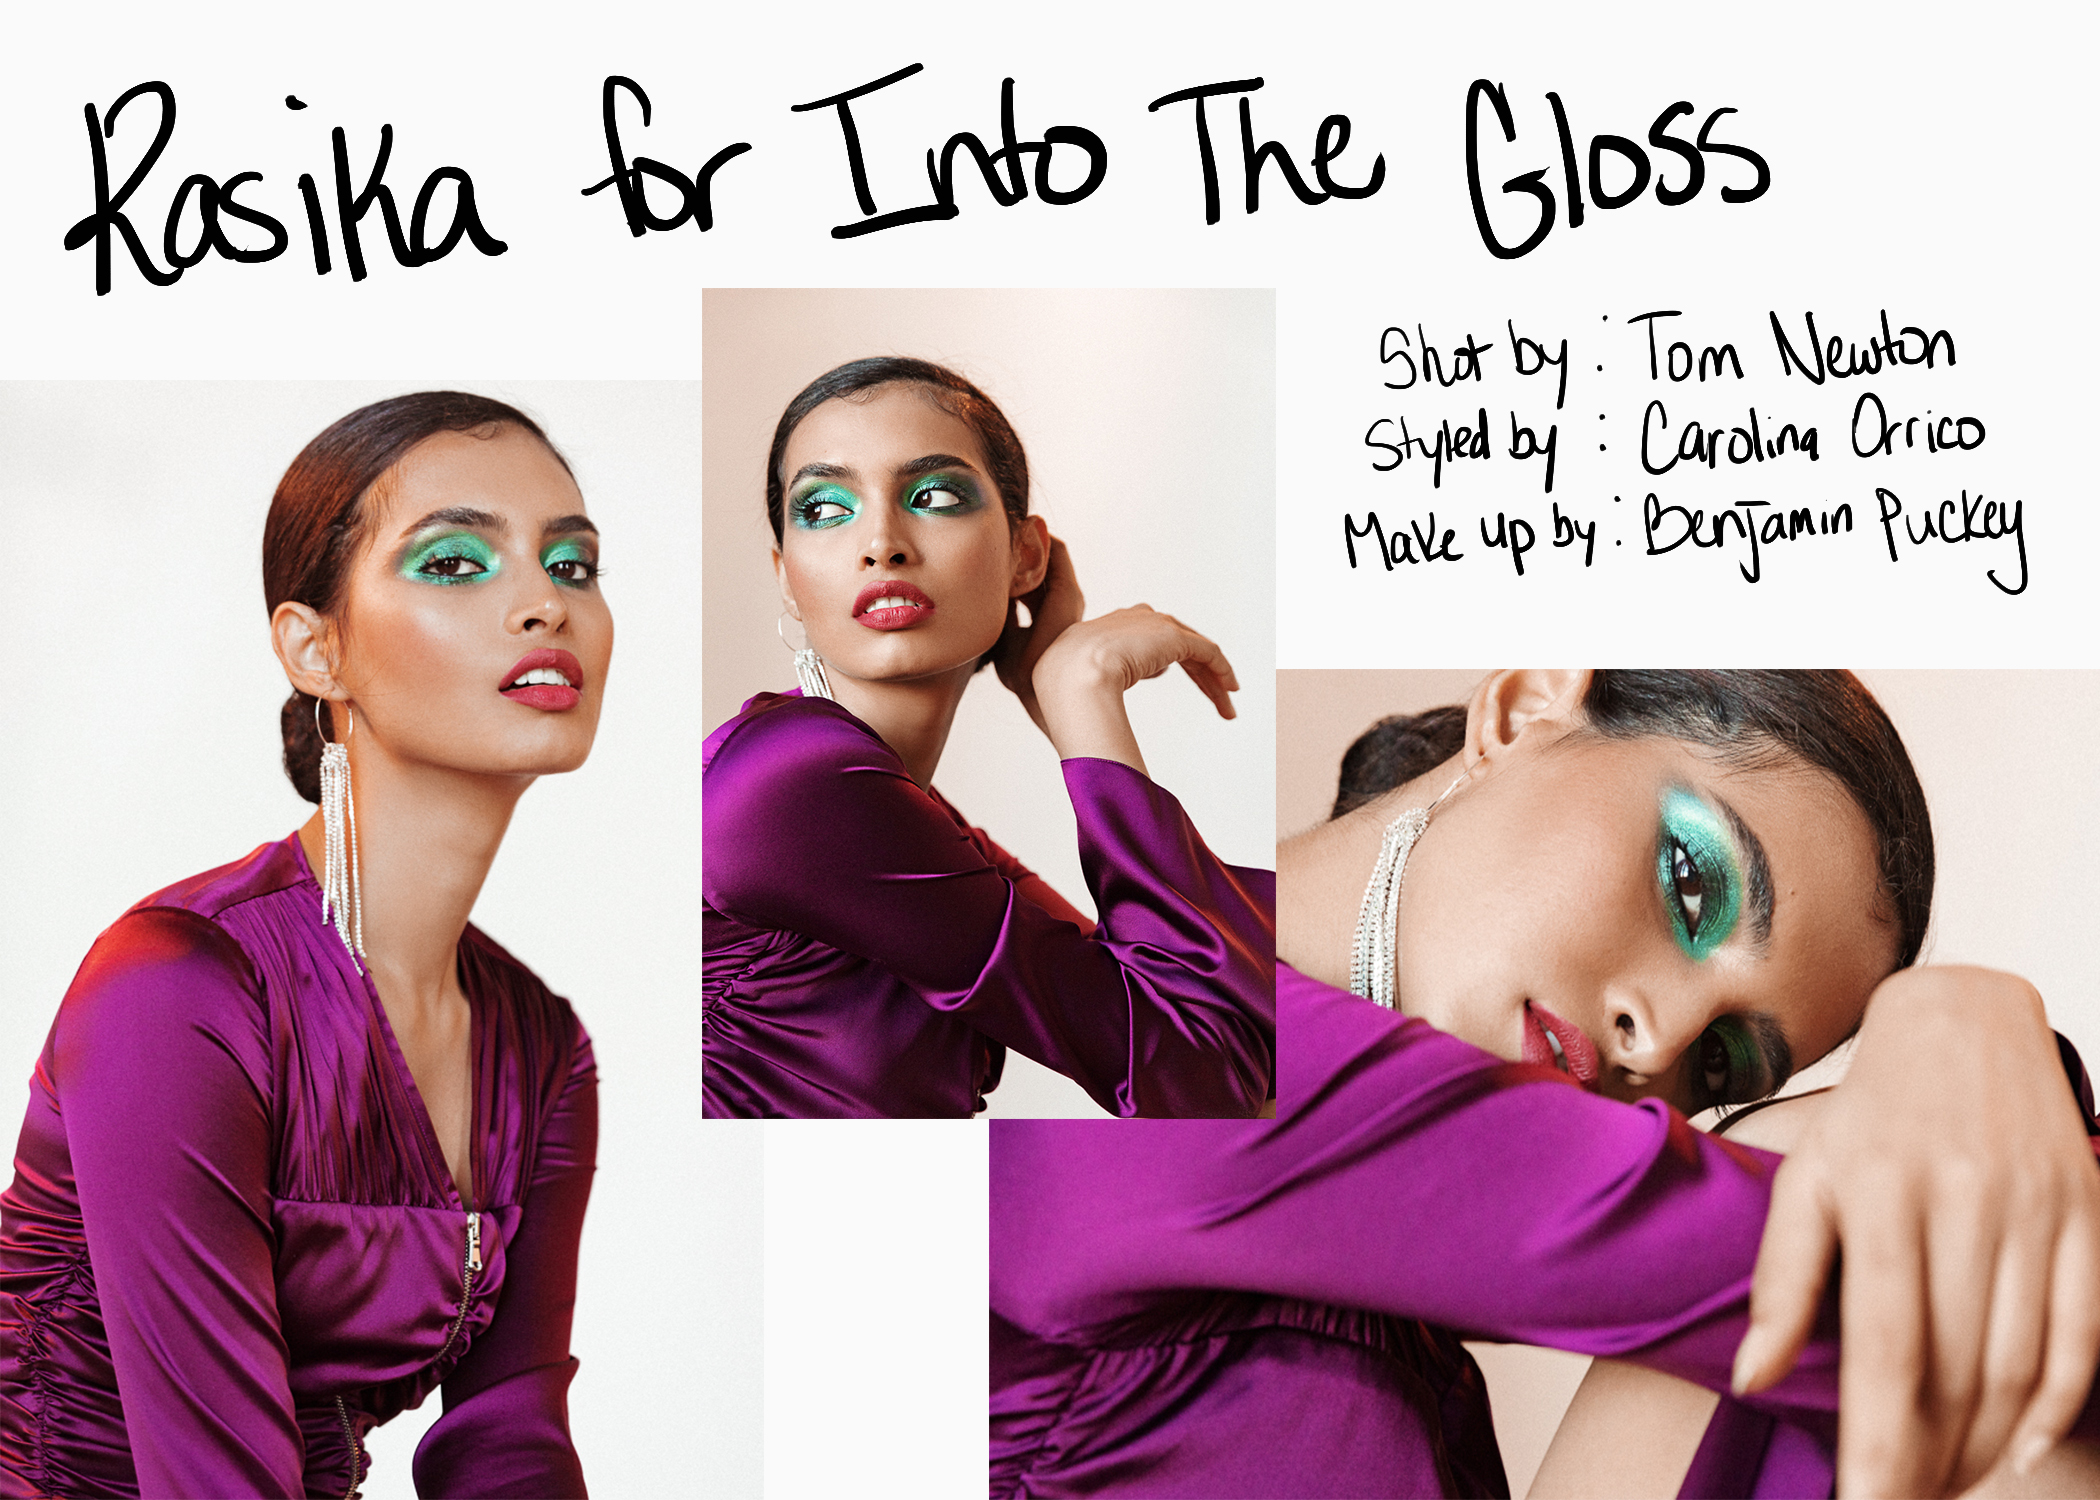 intothe gloss online.jpg